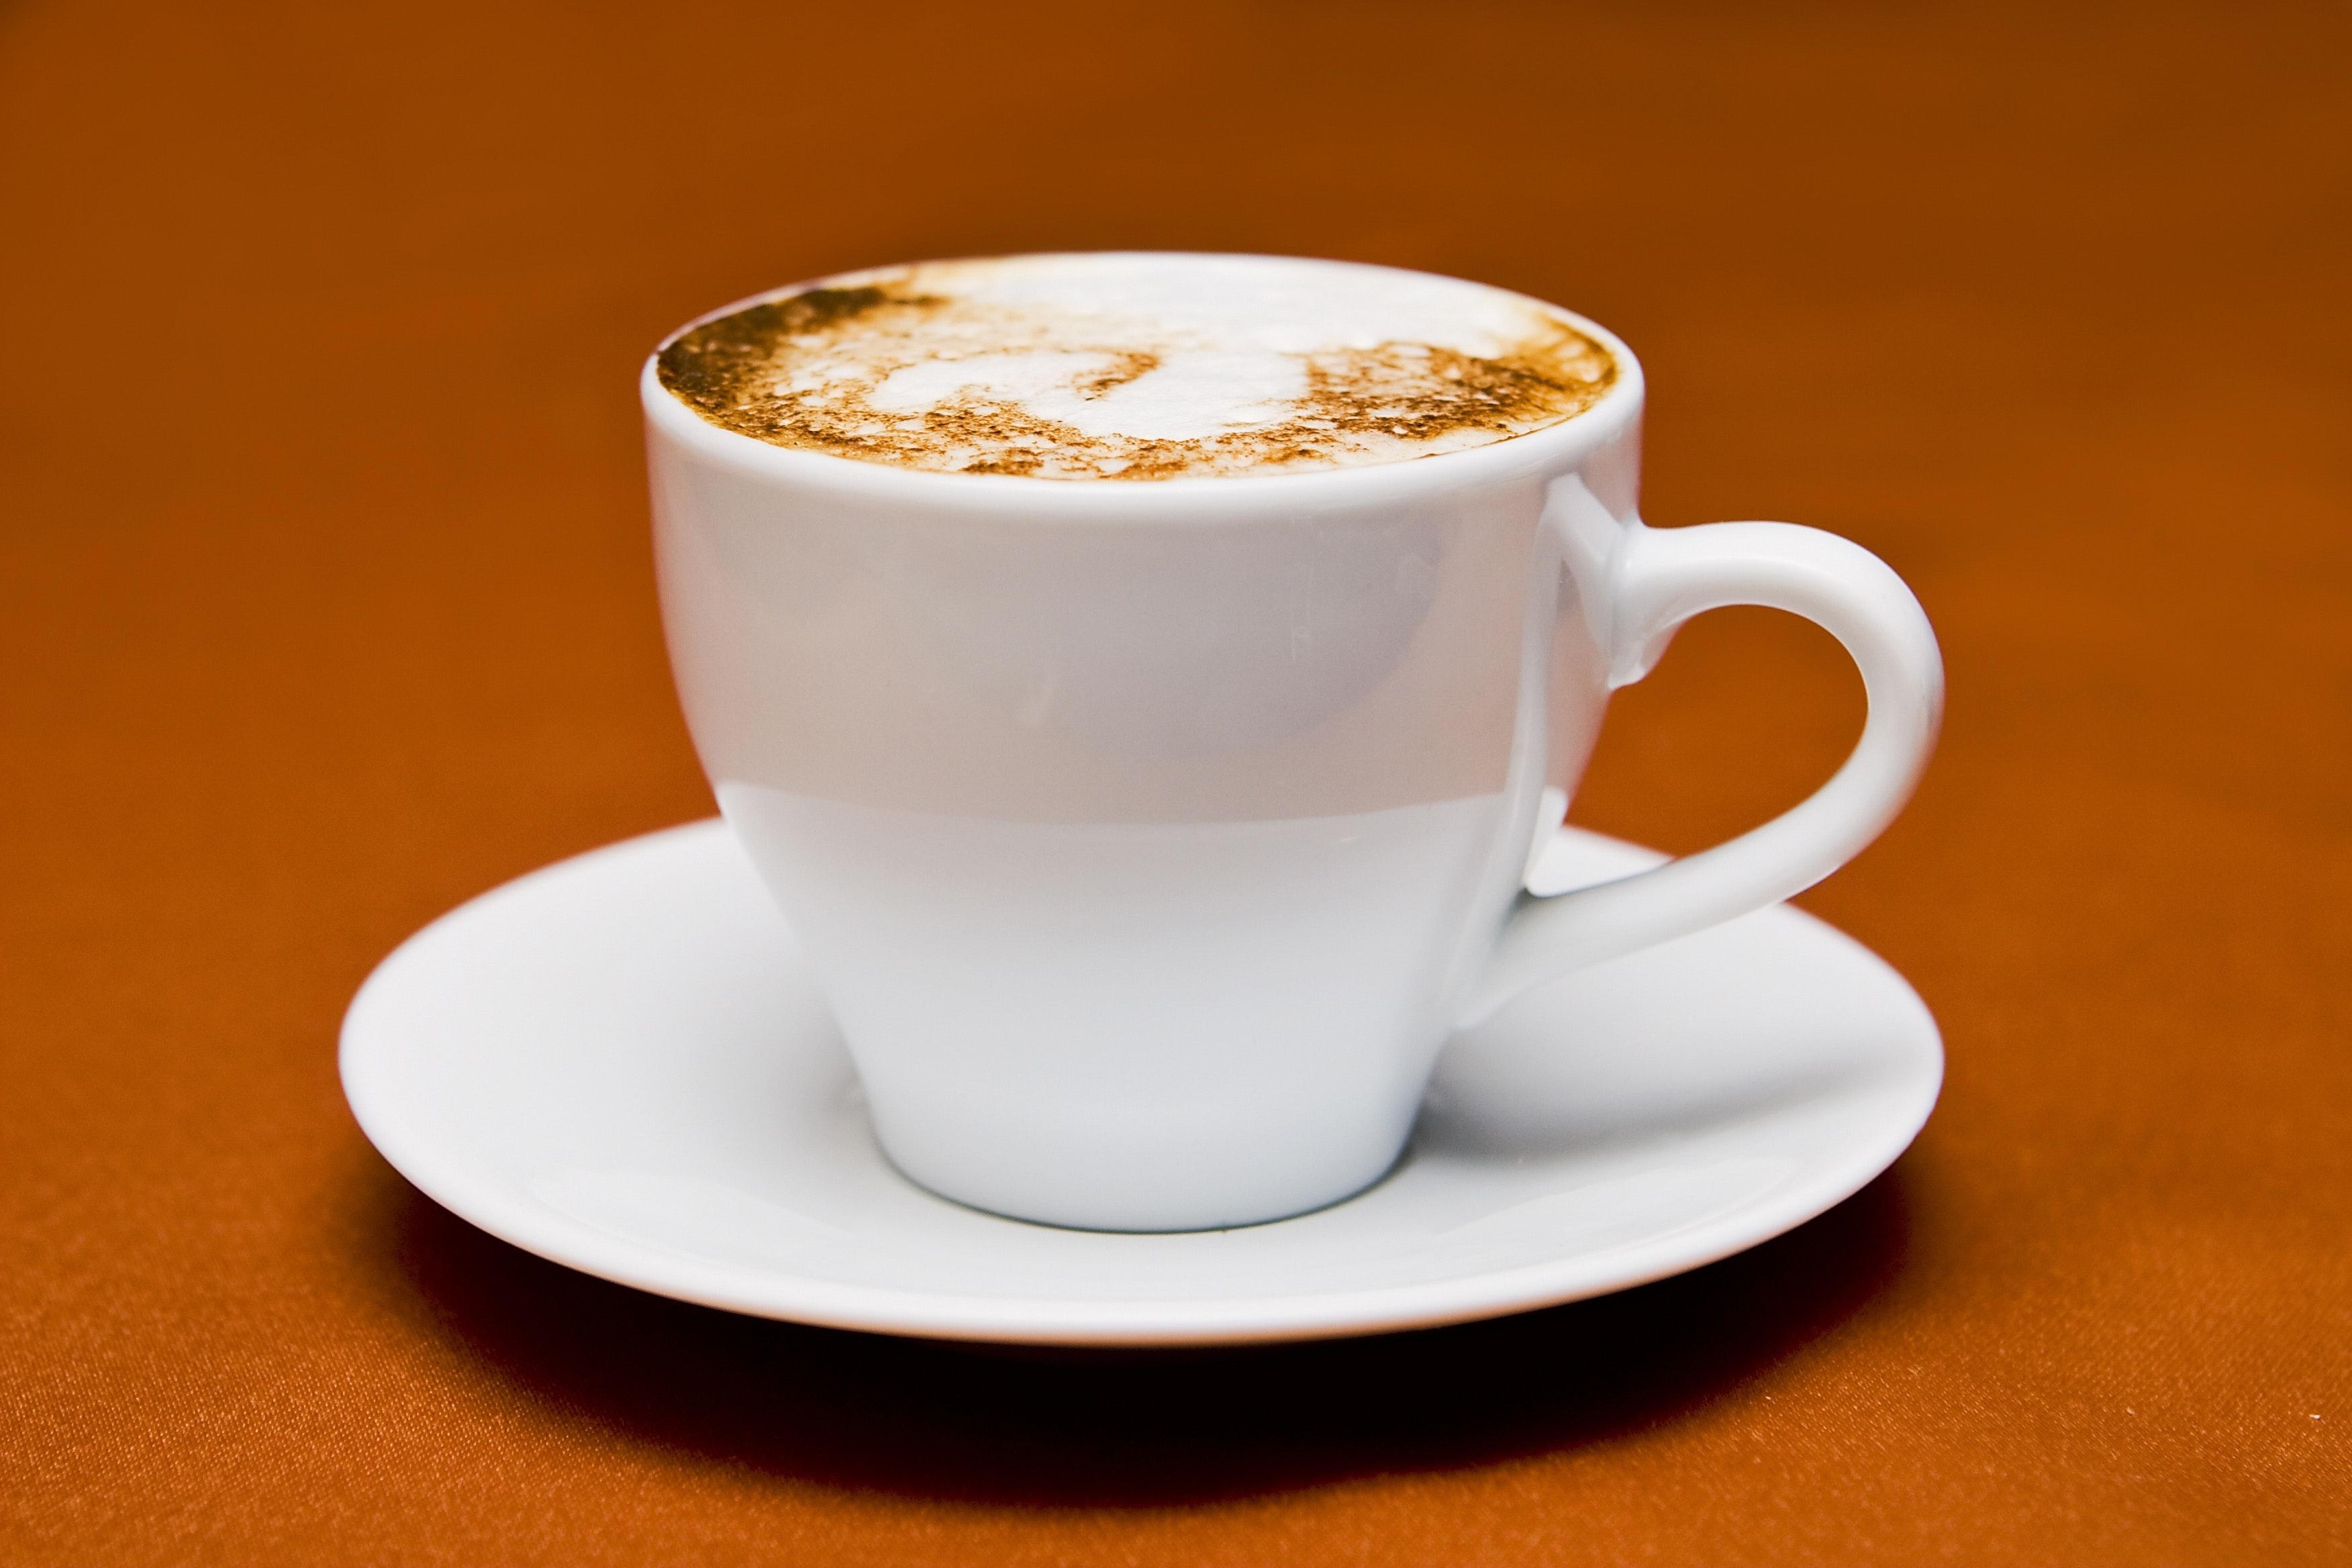 White Ceramic Cup on White Ceramic Saucer, Beverage, Cup of coffee, Mocha, Liquid, HQ Photo